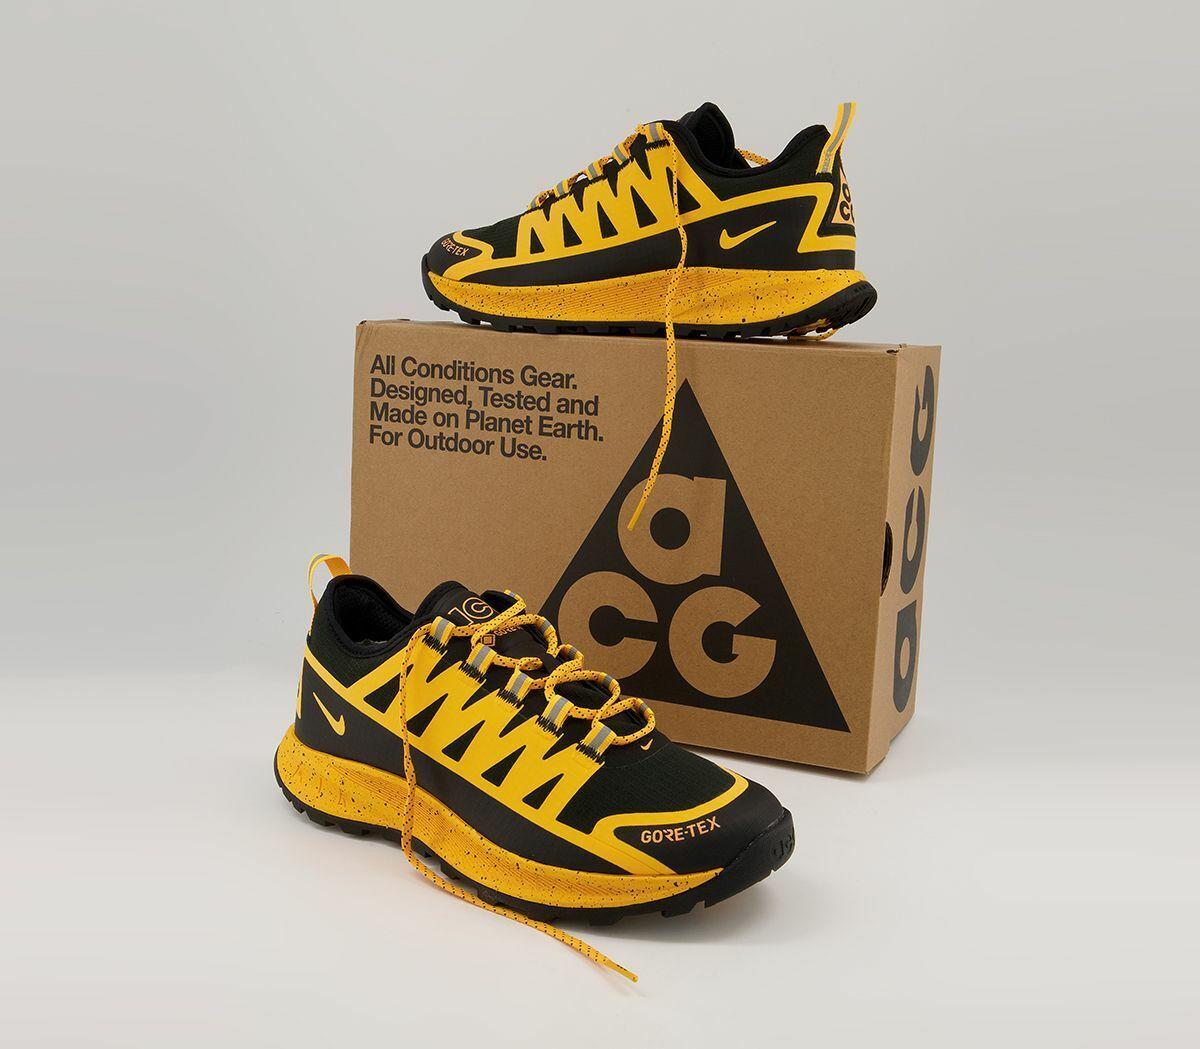 Nike ACG Air Nasu Gore-Tex Black Men's Hiking Trail Trainers Shoes UK 6_6.5_7